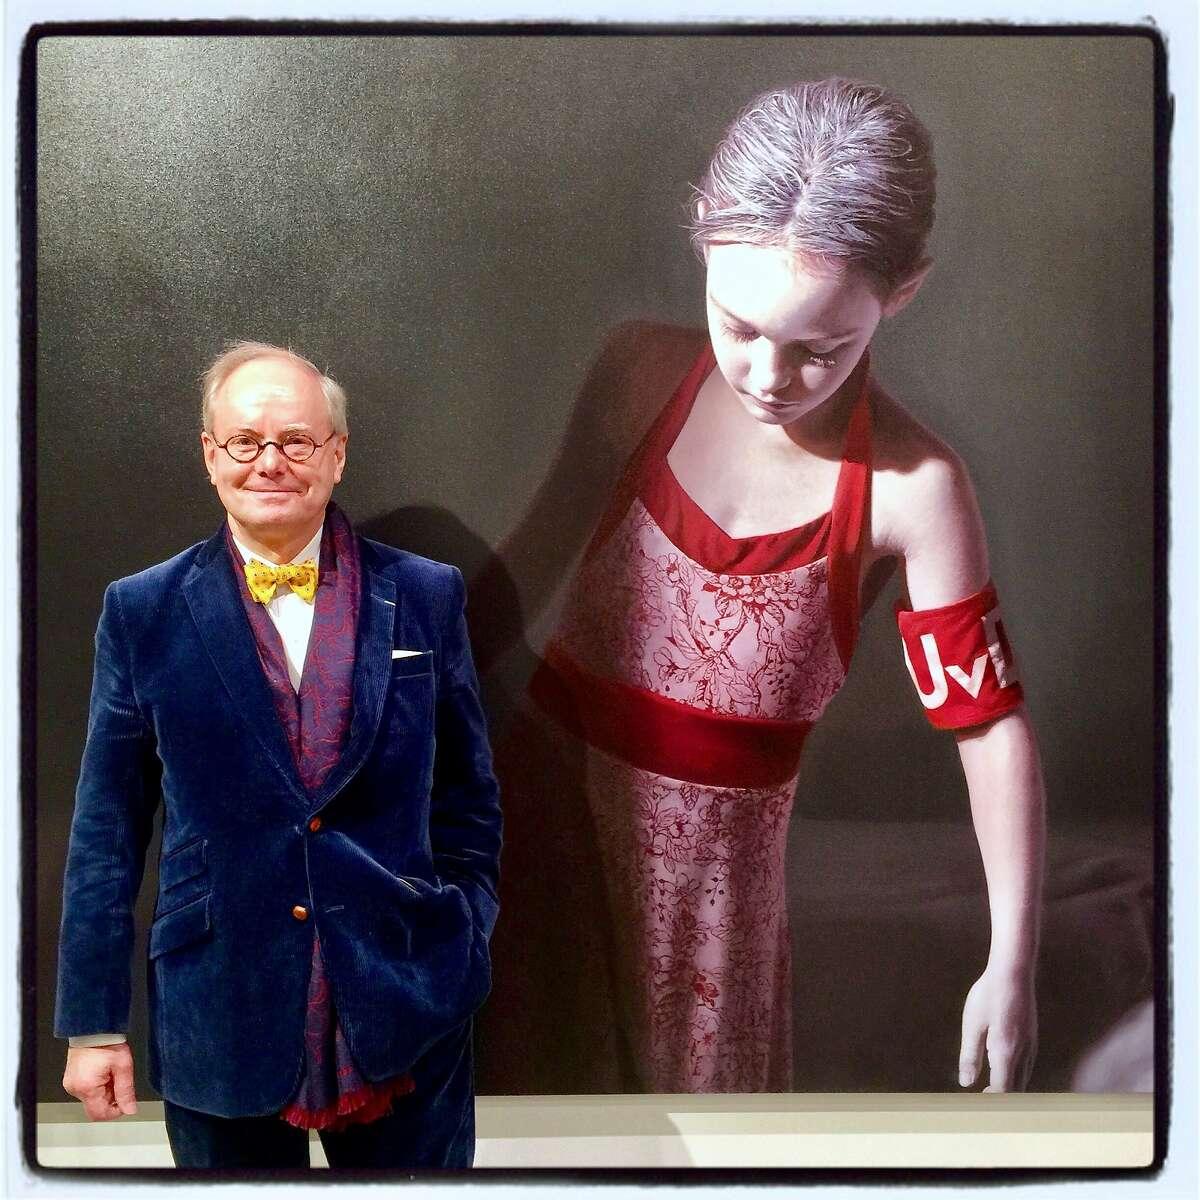 Gallerist Martin Muller opened his new Tenderloin space with a Gottfried Helnwein exhibit. Jan. 9 2017.